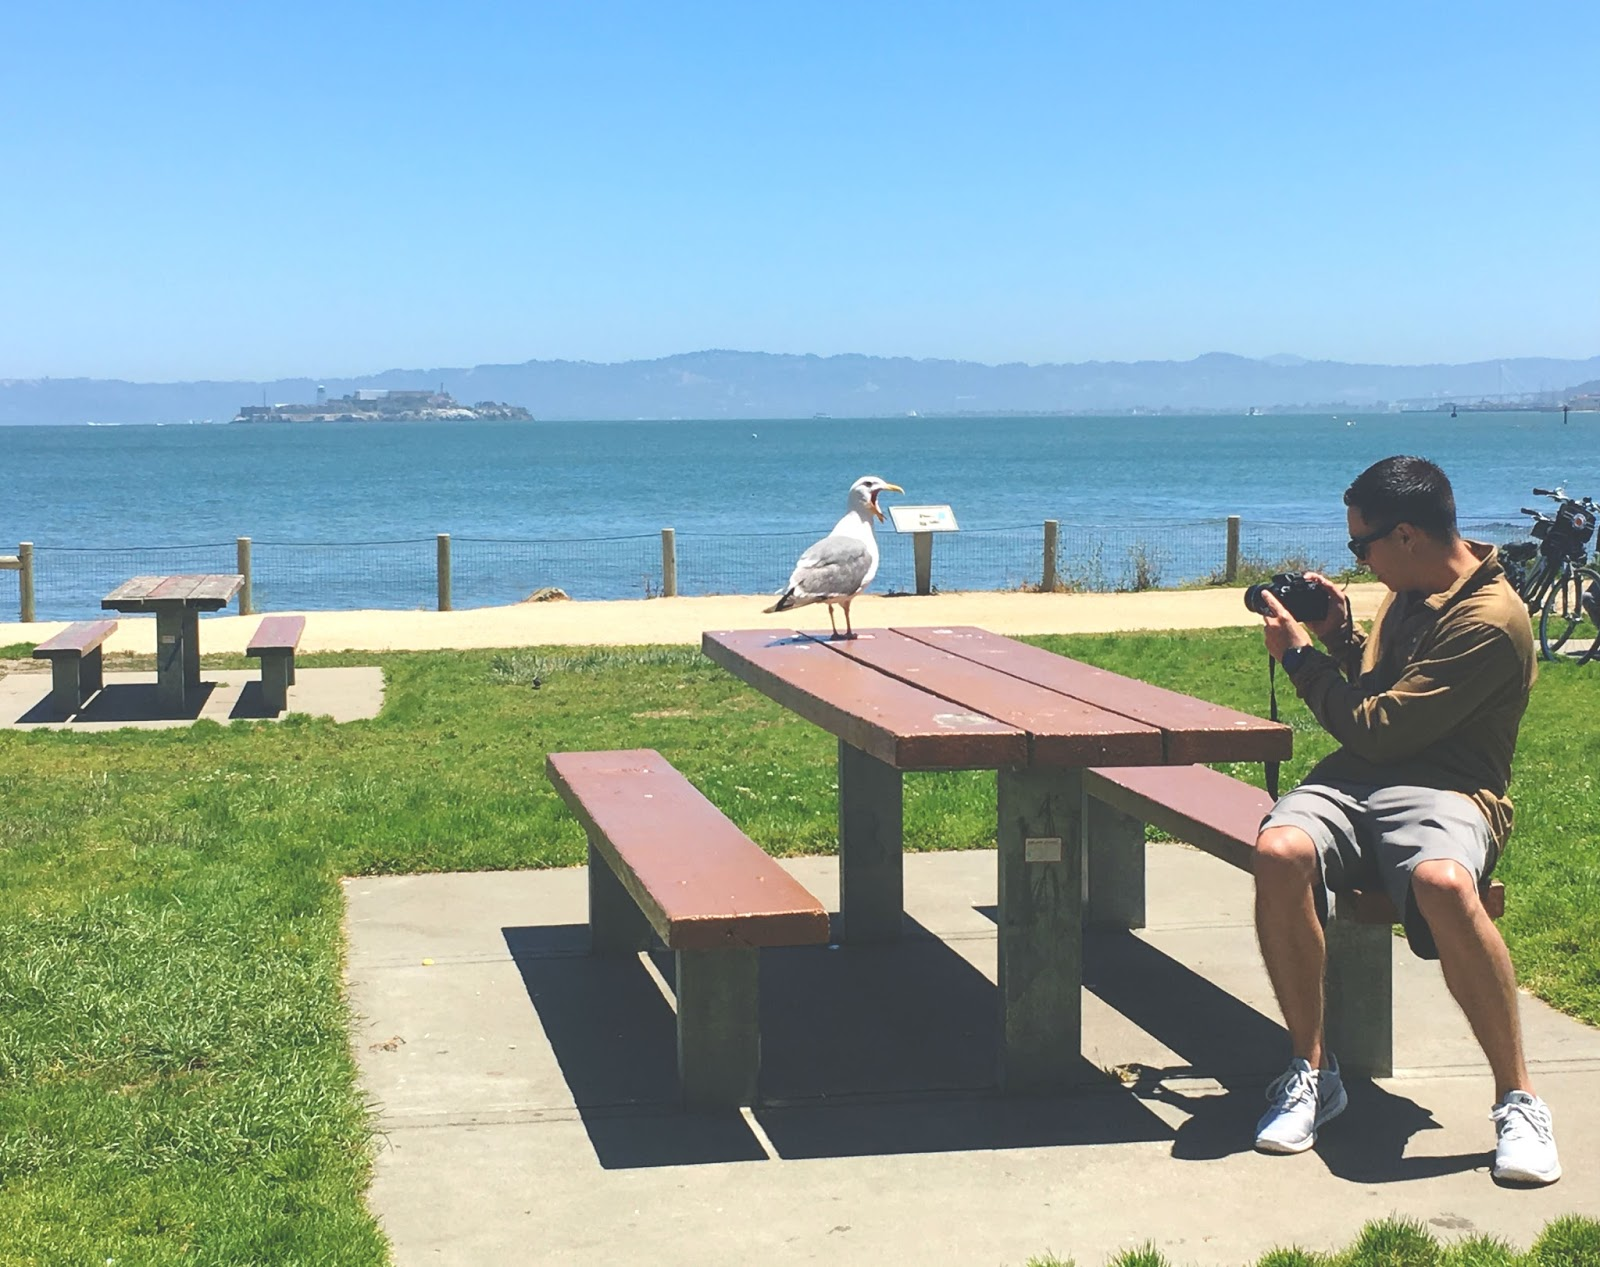 West Bluff Park in San Francisco, California